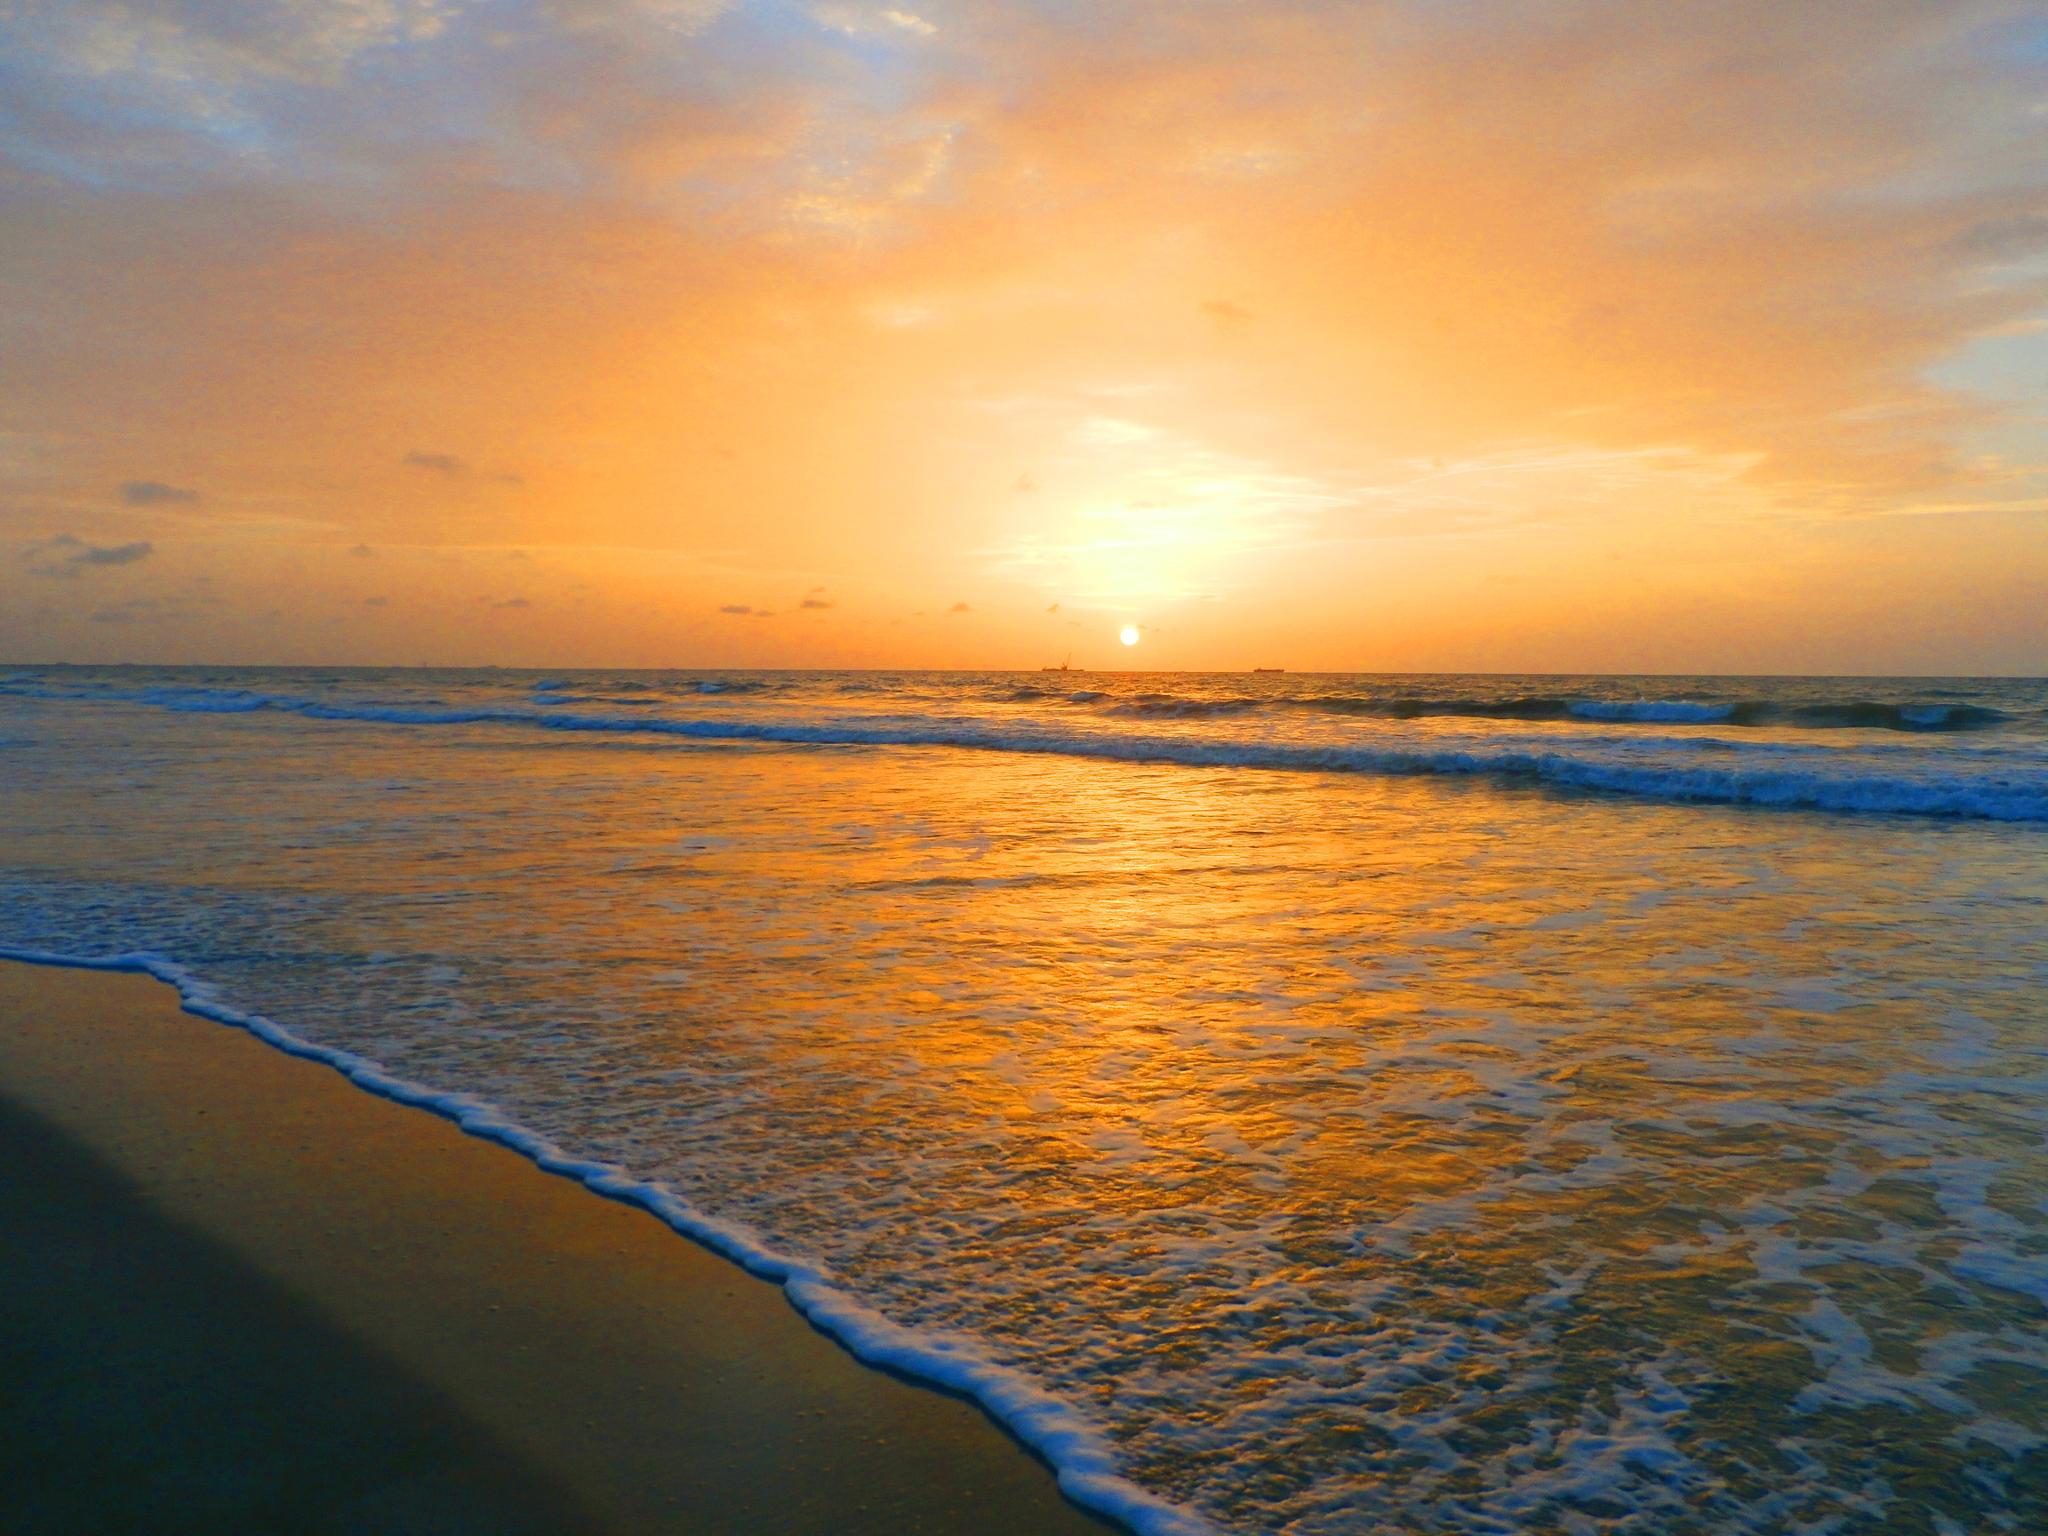 Sunrise over Ocean by Julie